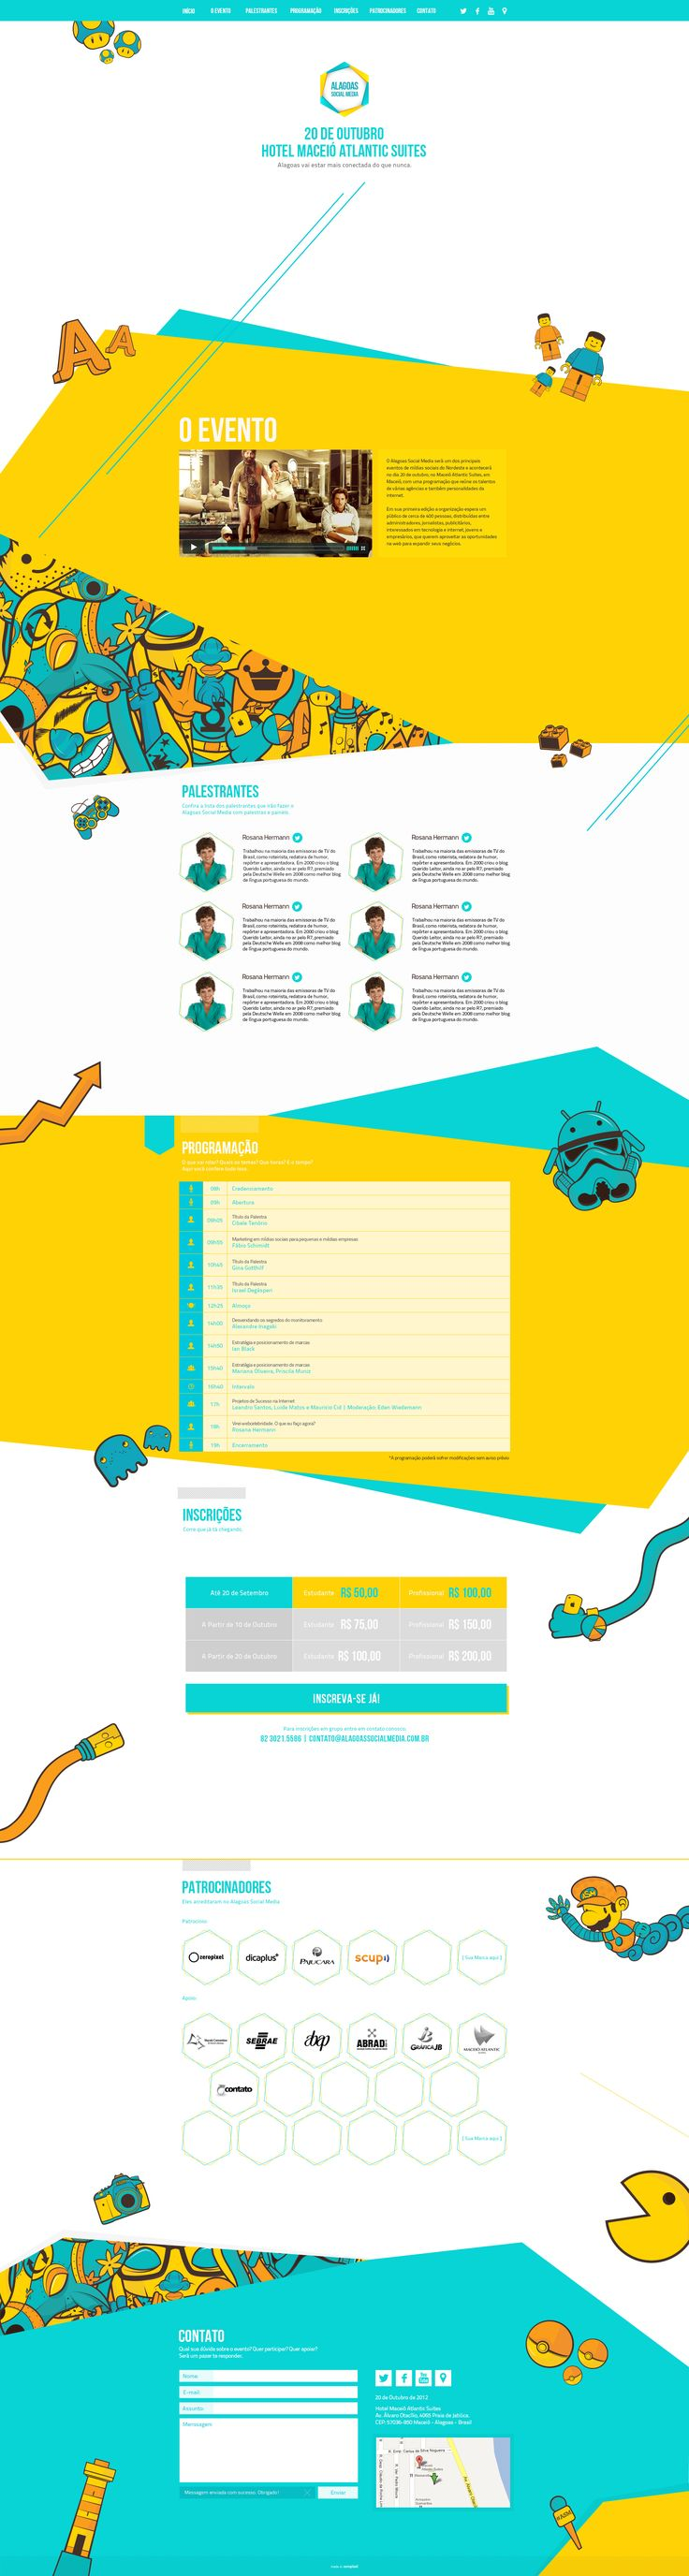 Unique Web Design, Alagoas Social Media #webdesign #design (http://www.pinterest.com/aldenchong/)